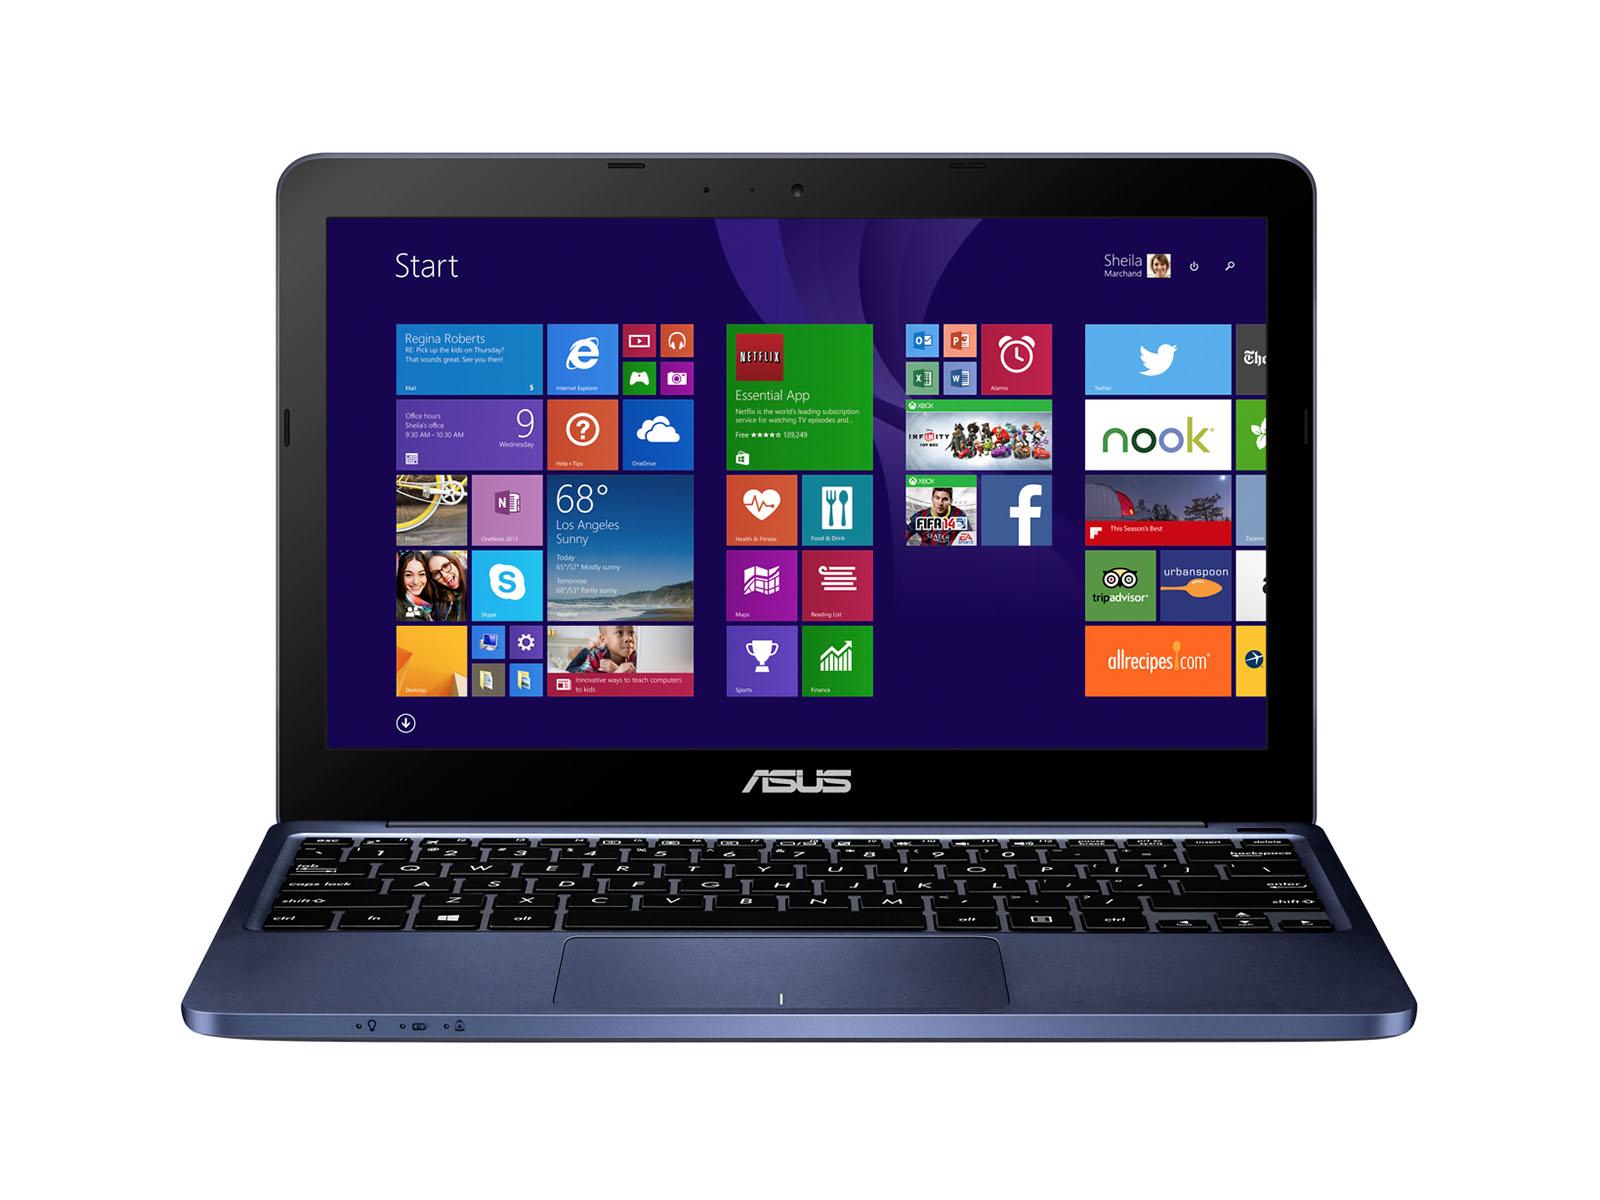 light-stylish-laptop-asus-eeebook-x205ta